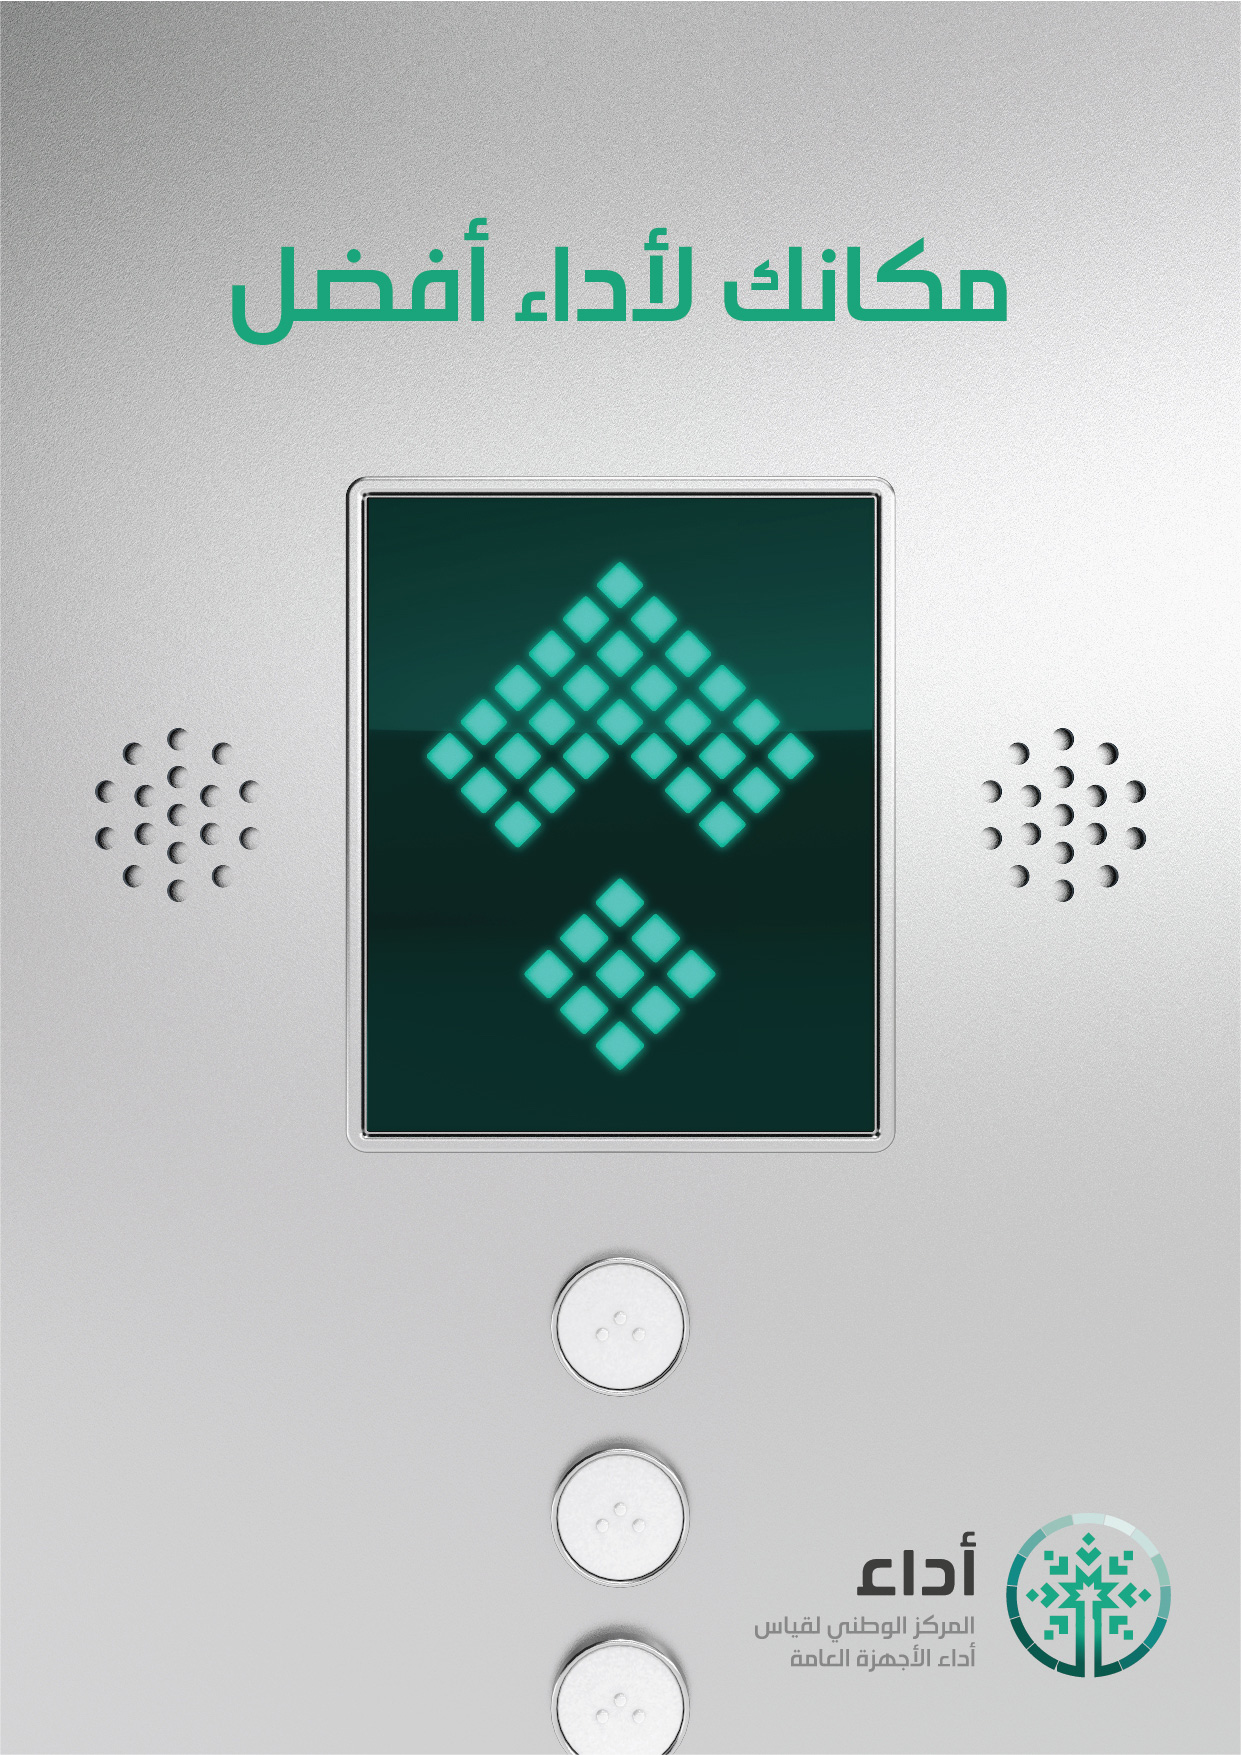 ADAA_HR_YOUR-PLACE_7-Elevator.jpg